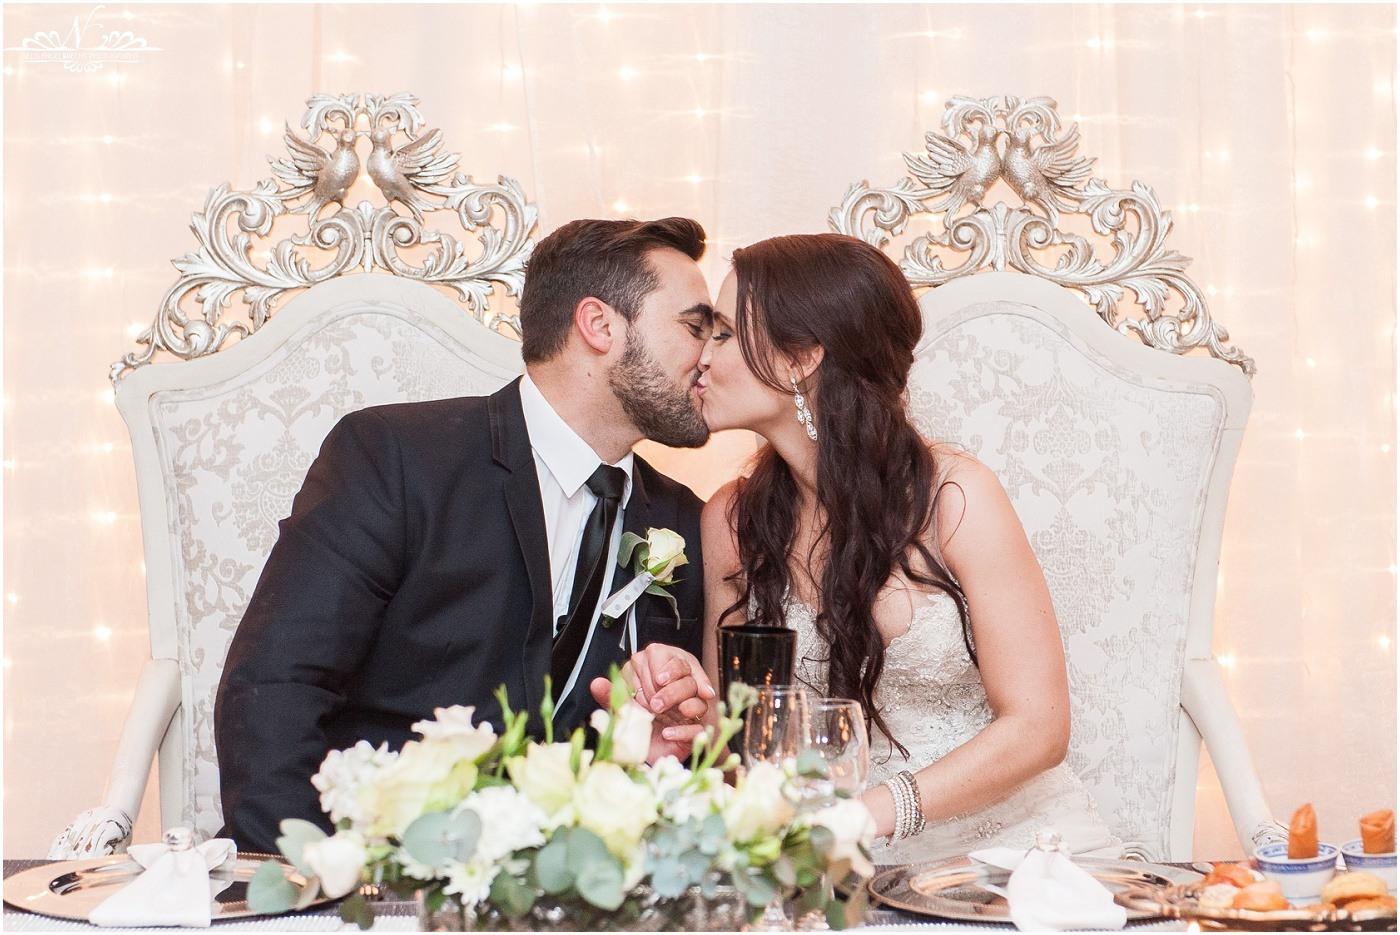 Eensgezind-Wedding-Photos-Nelis-Engelbrecht-Photography-173